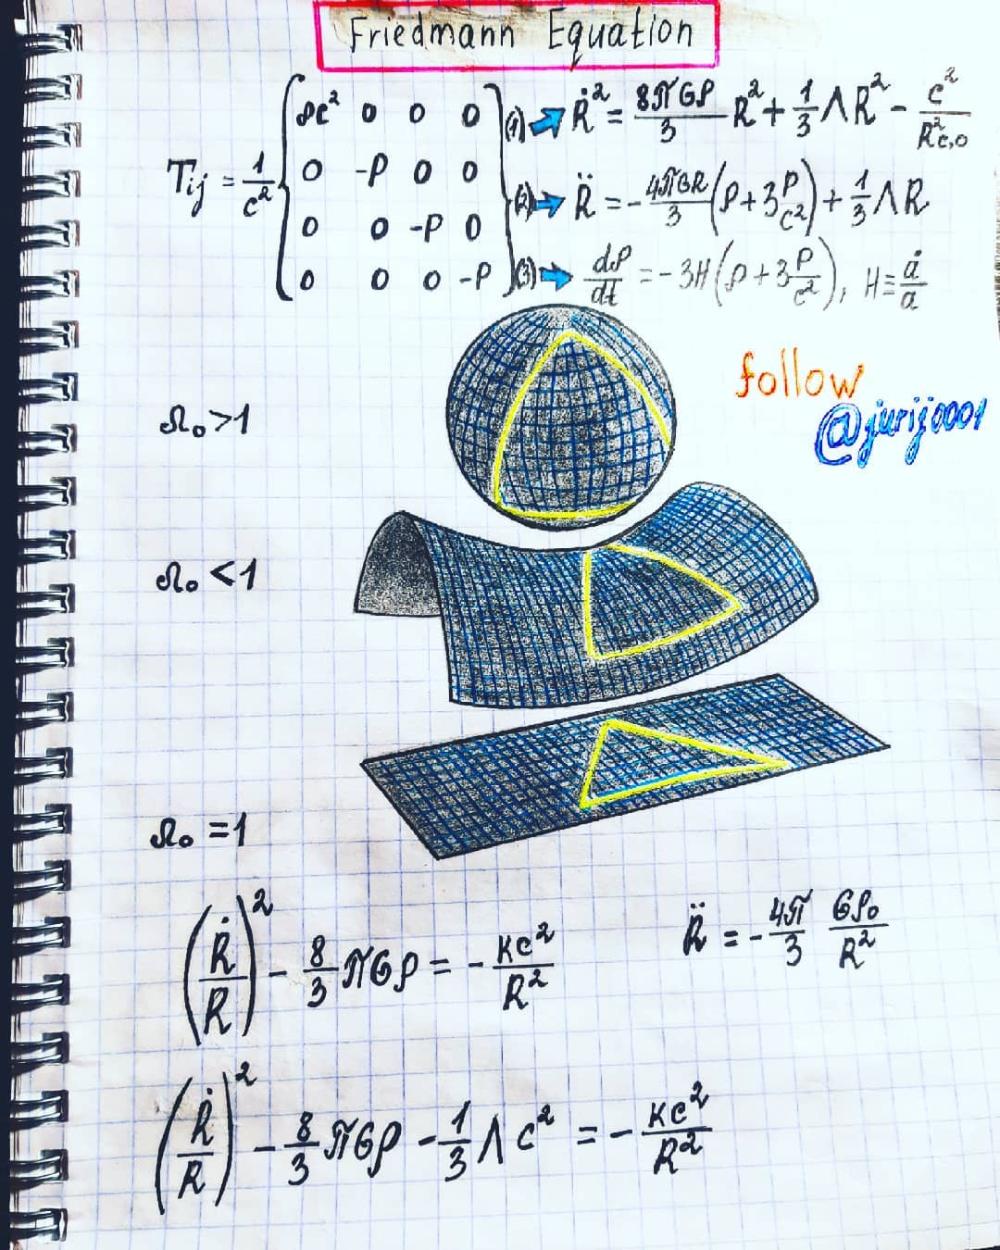 Friedman Equation Illustration By Physics Teacher Yuri Kovalenok Jurij0001 Physics And Mathematics Physics Formulas Physics